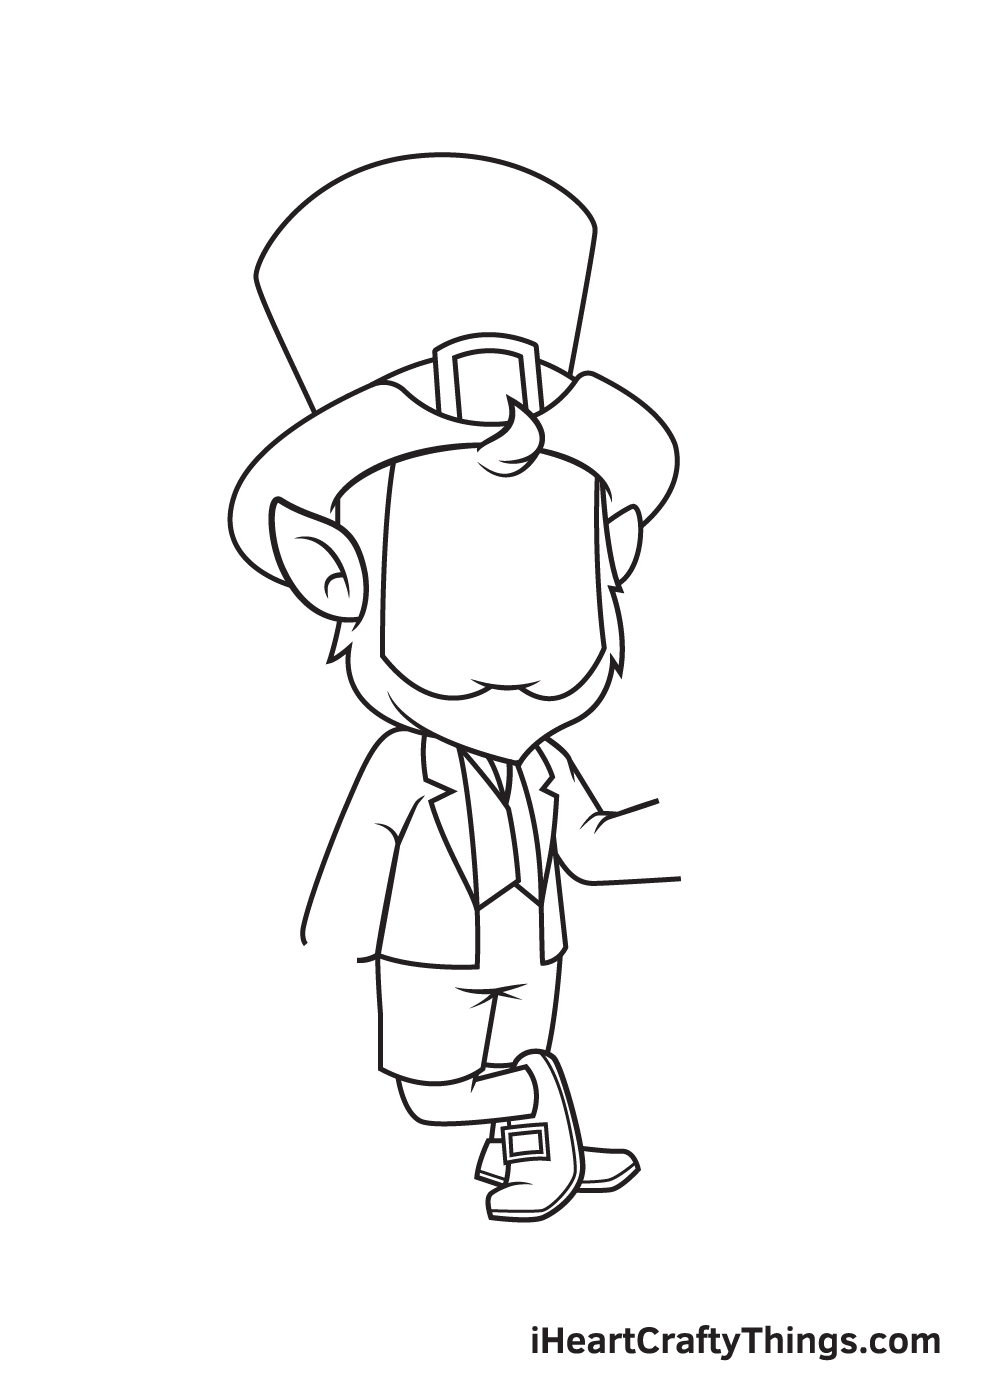 Leprechaun Drawing – Step 4